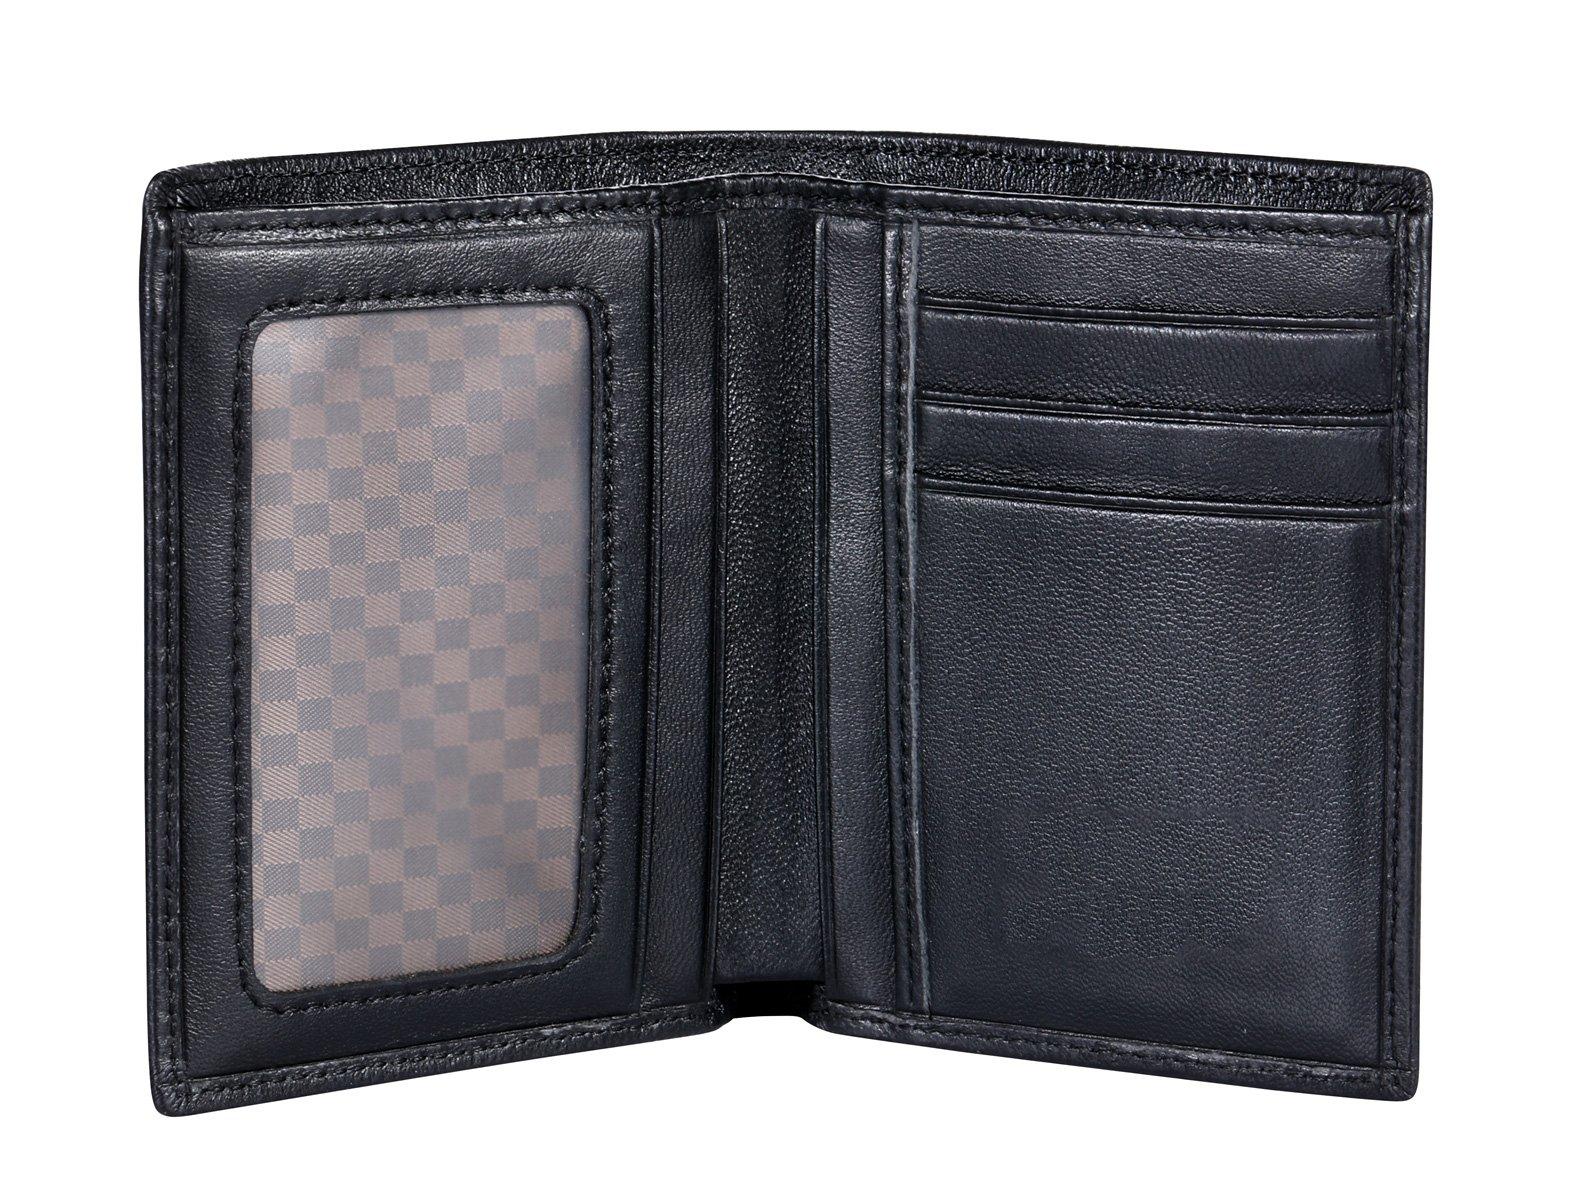 VIDENG Geunine Goatskin Leather Wallets Slim RFID Blocking Bifold Wallet Card Holder Purse (WSV-Black)